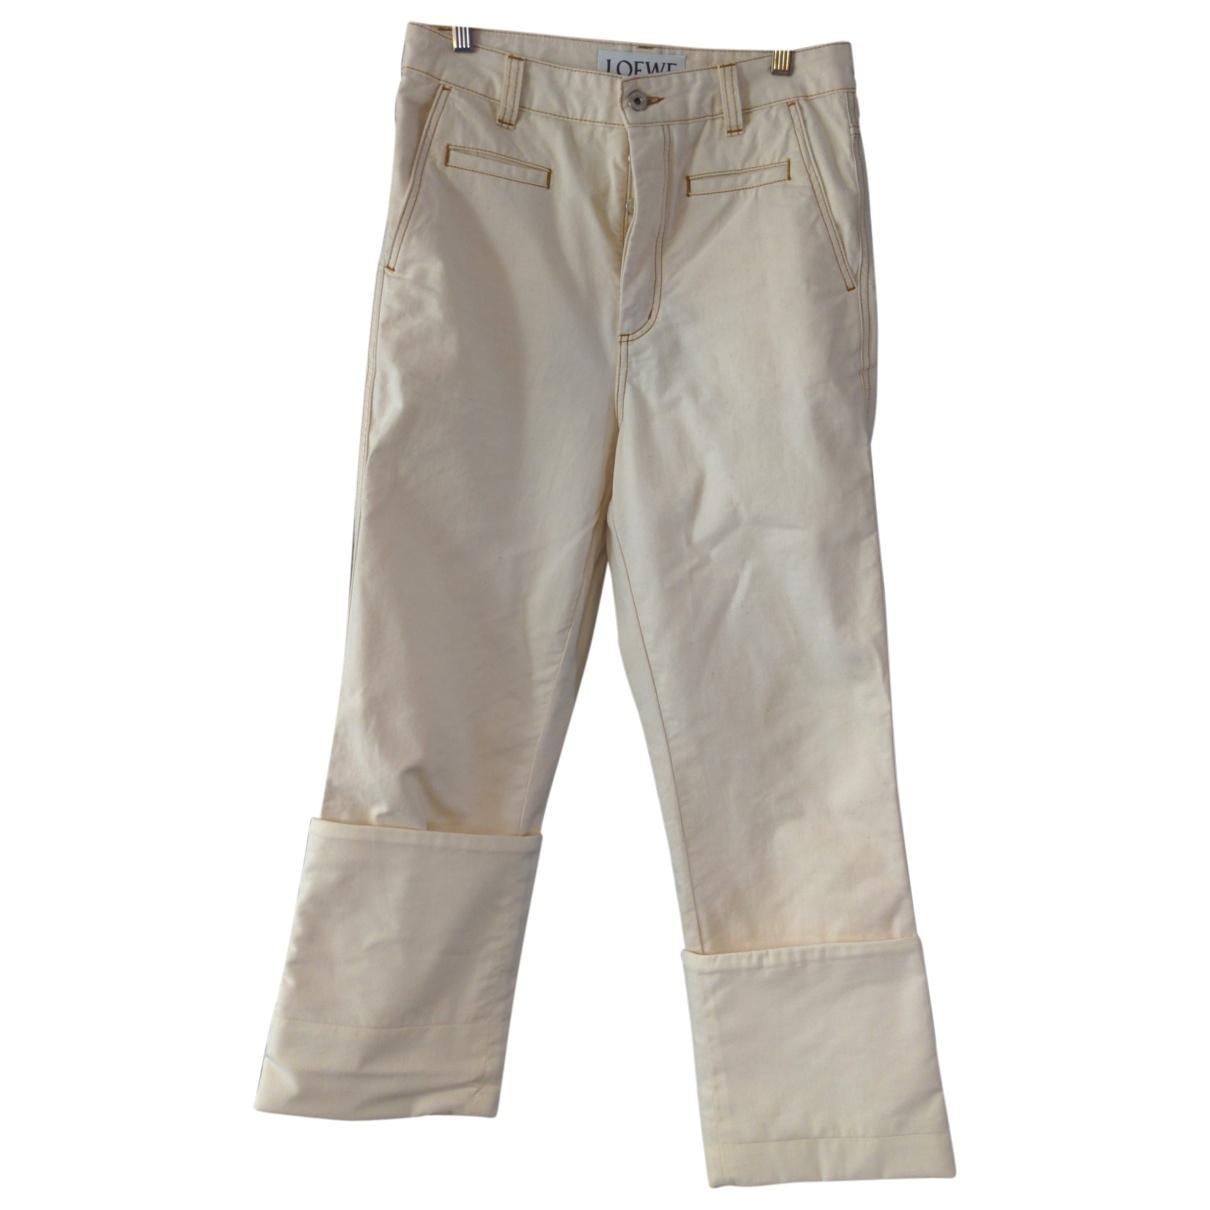 Loewe \N Beige Cotton Jeans for Men 38 FR